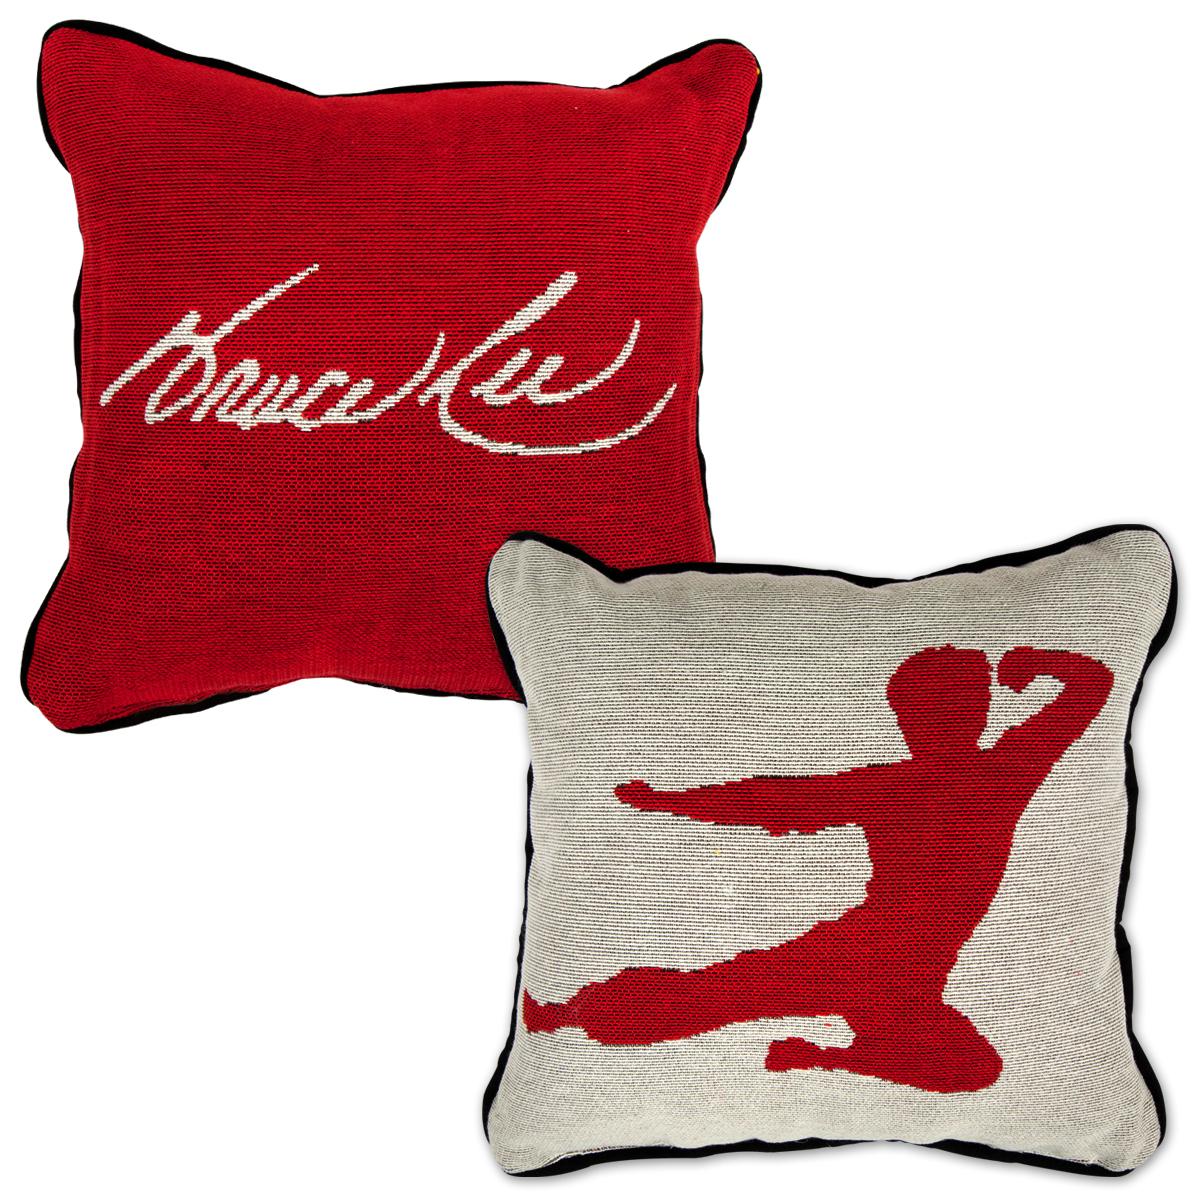 Bruce Lee Flying Man Tapestry Pillow